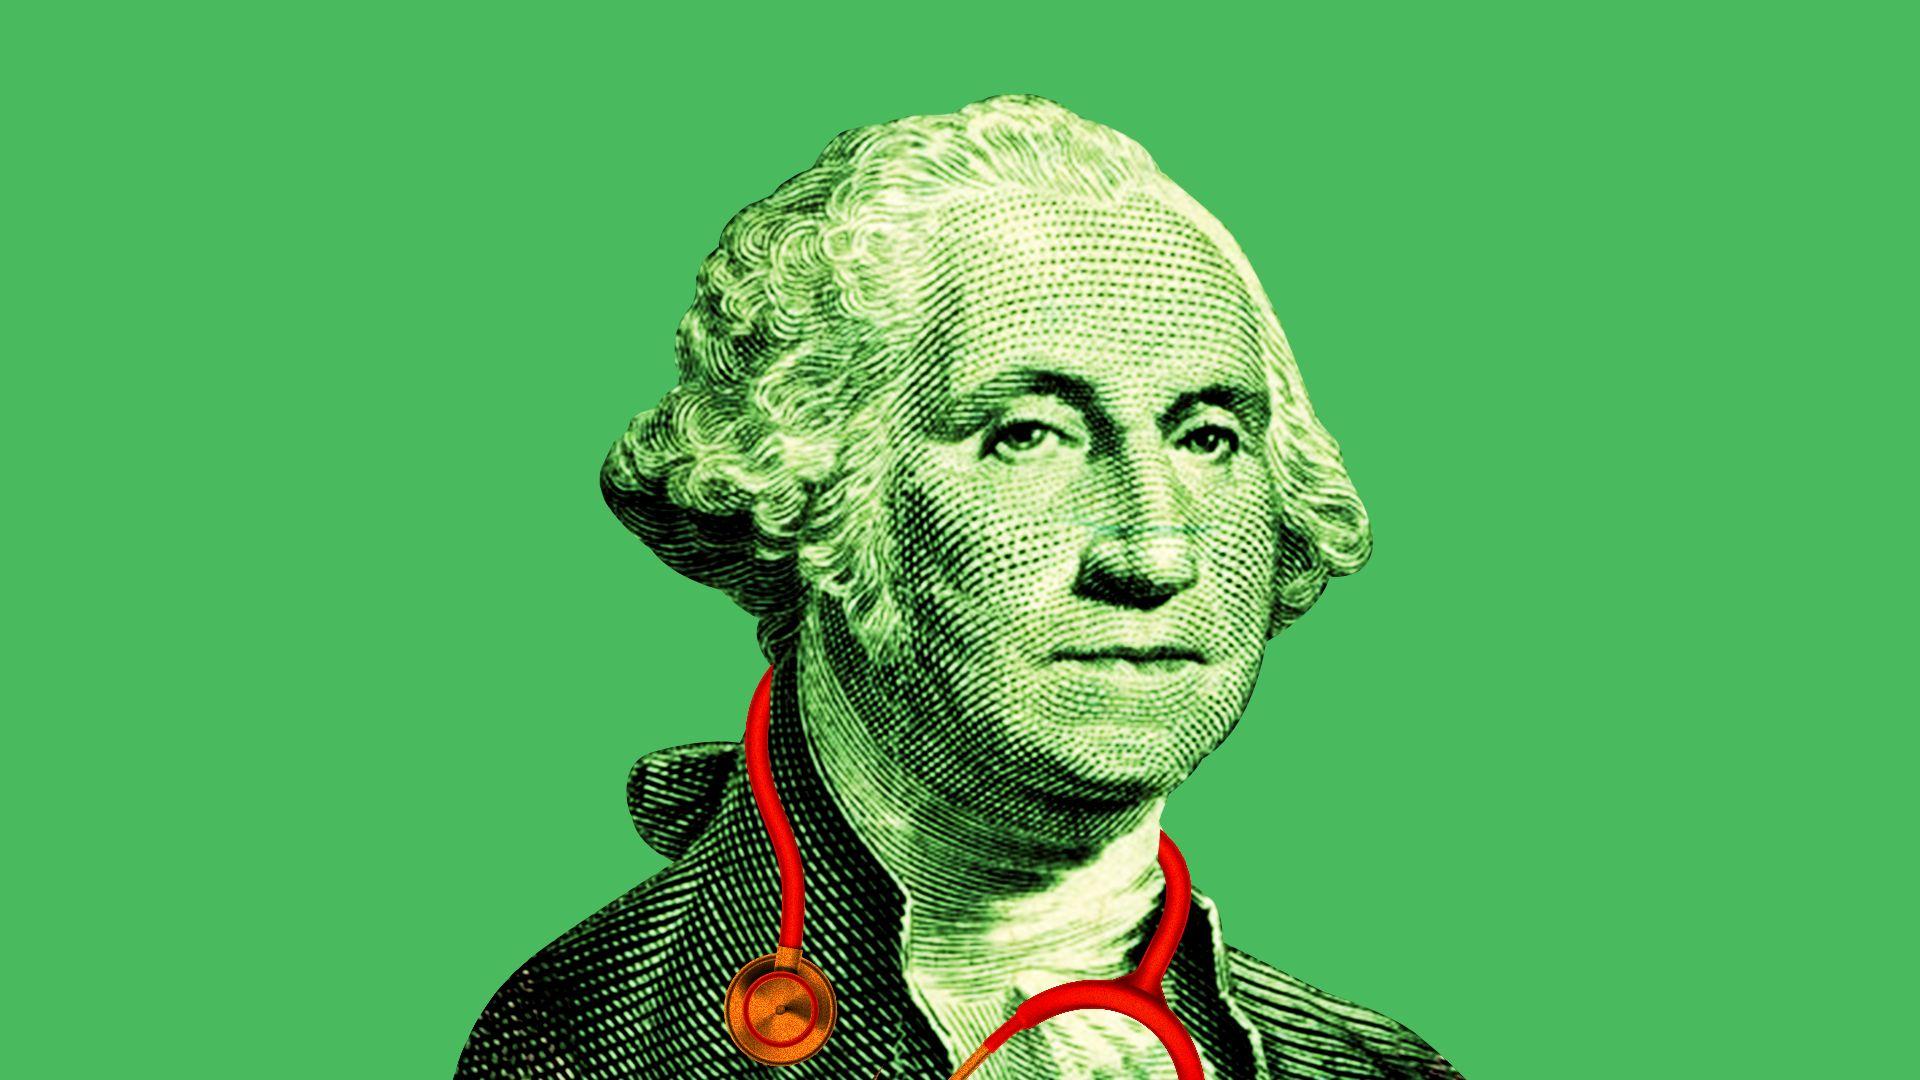 Illustration of George Washington with a stethoscope around his neck.